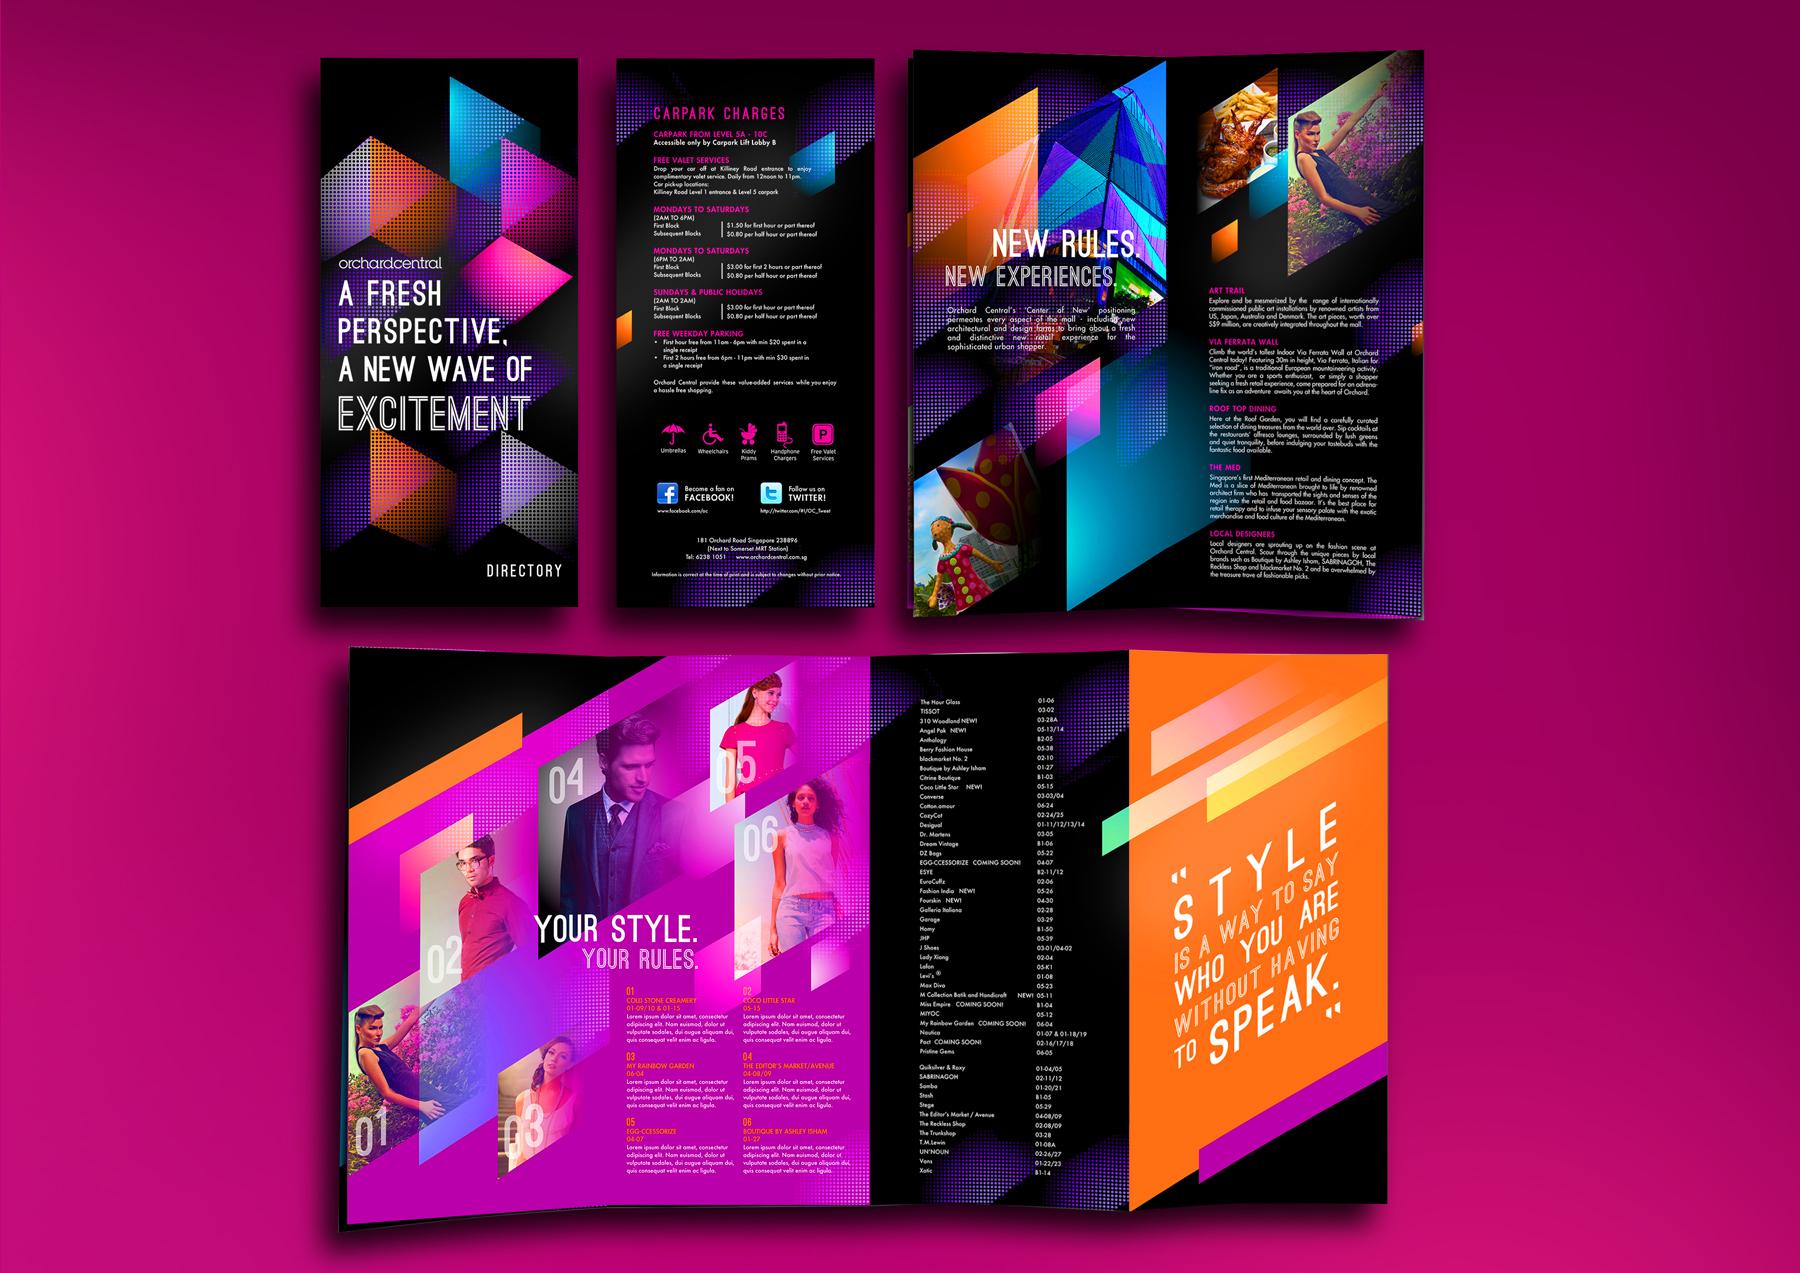 Design and Digital Marketing - Orchard Central Directory Brochure 1 Open- Leow Hou Teng